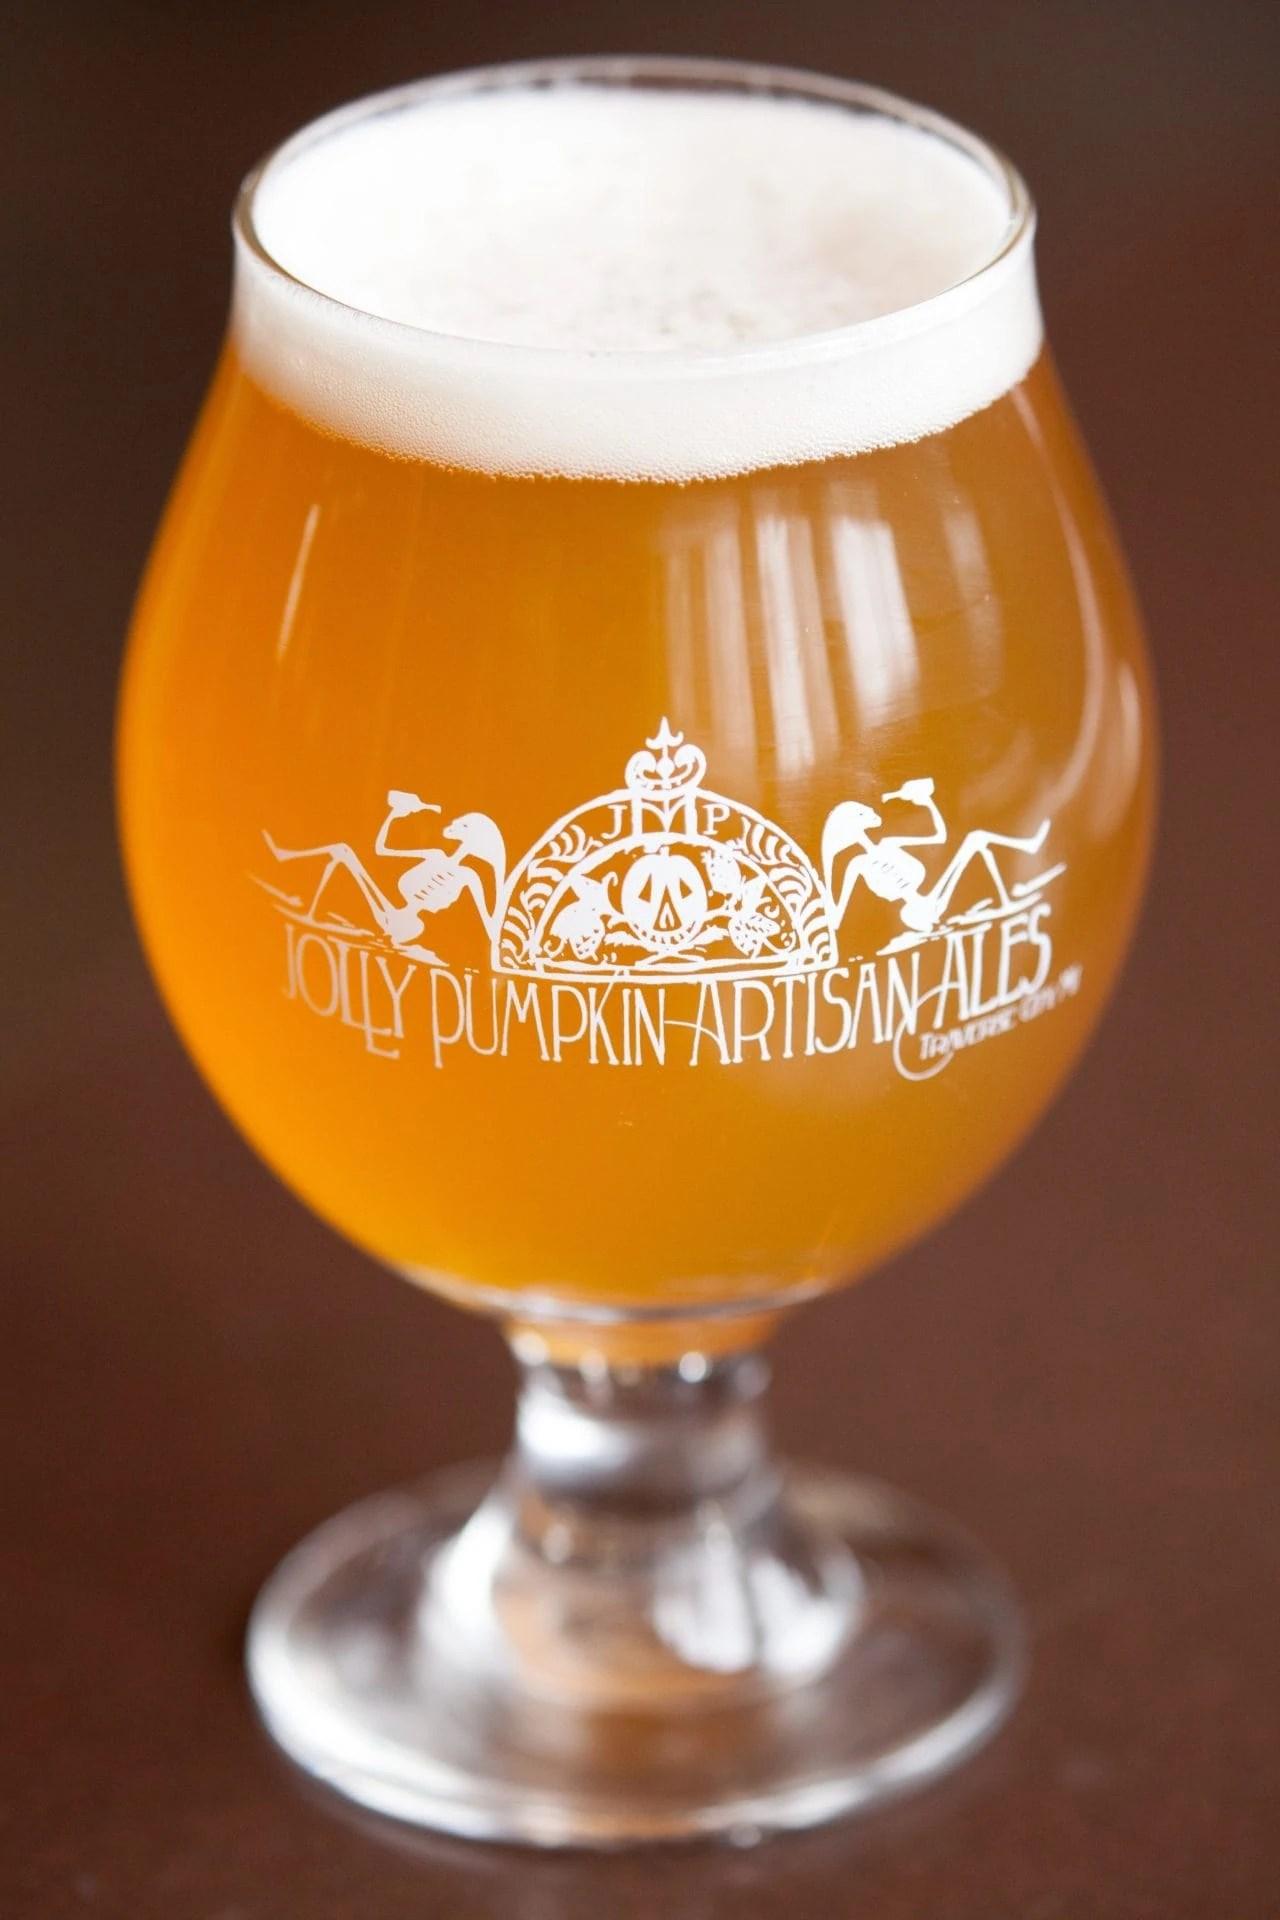 Jolly Pumpkins Master Brewer Talks Belgian Style Brews